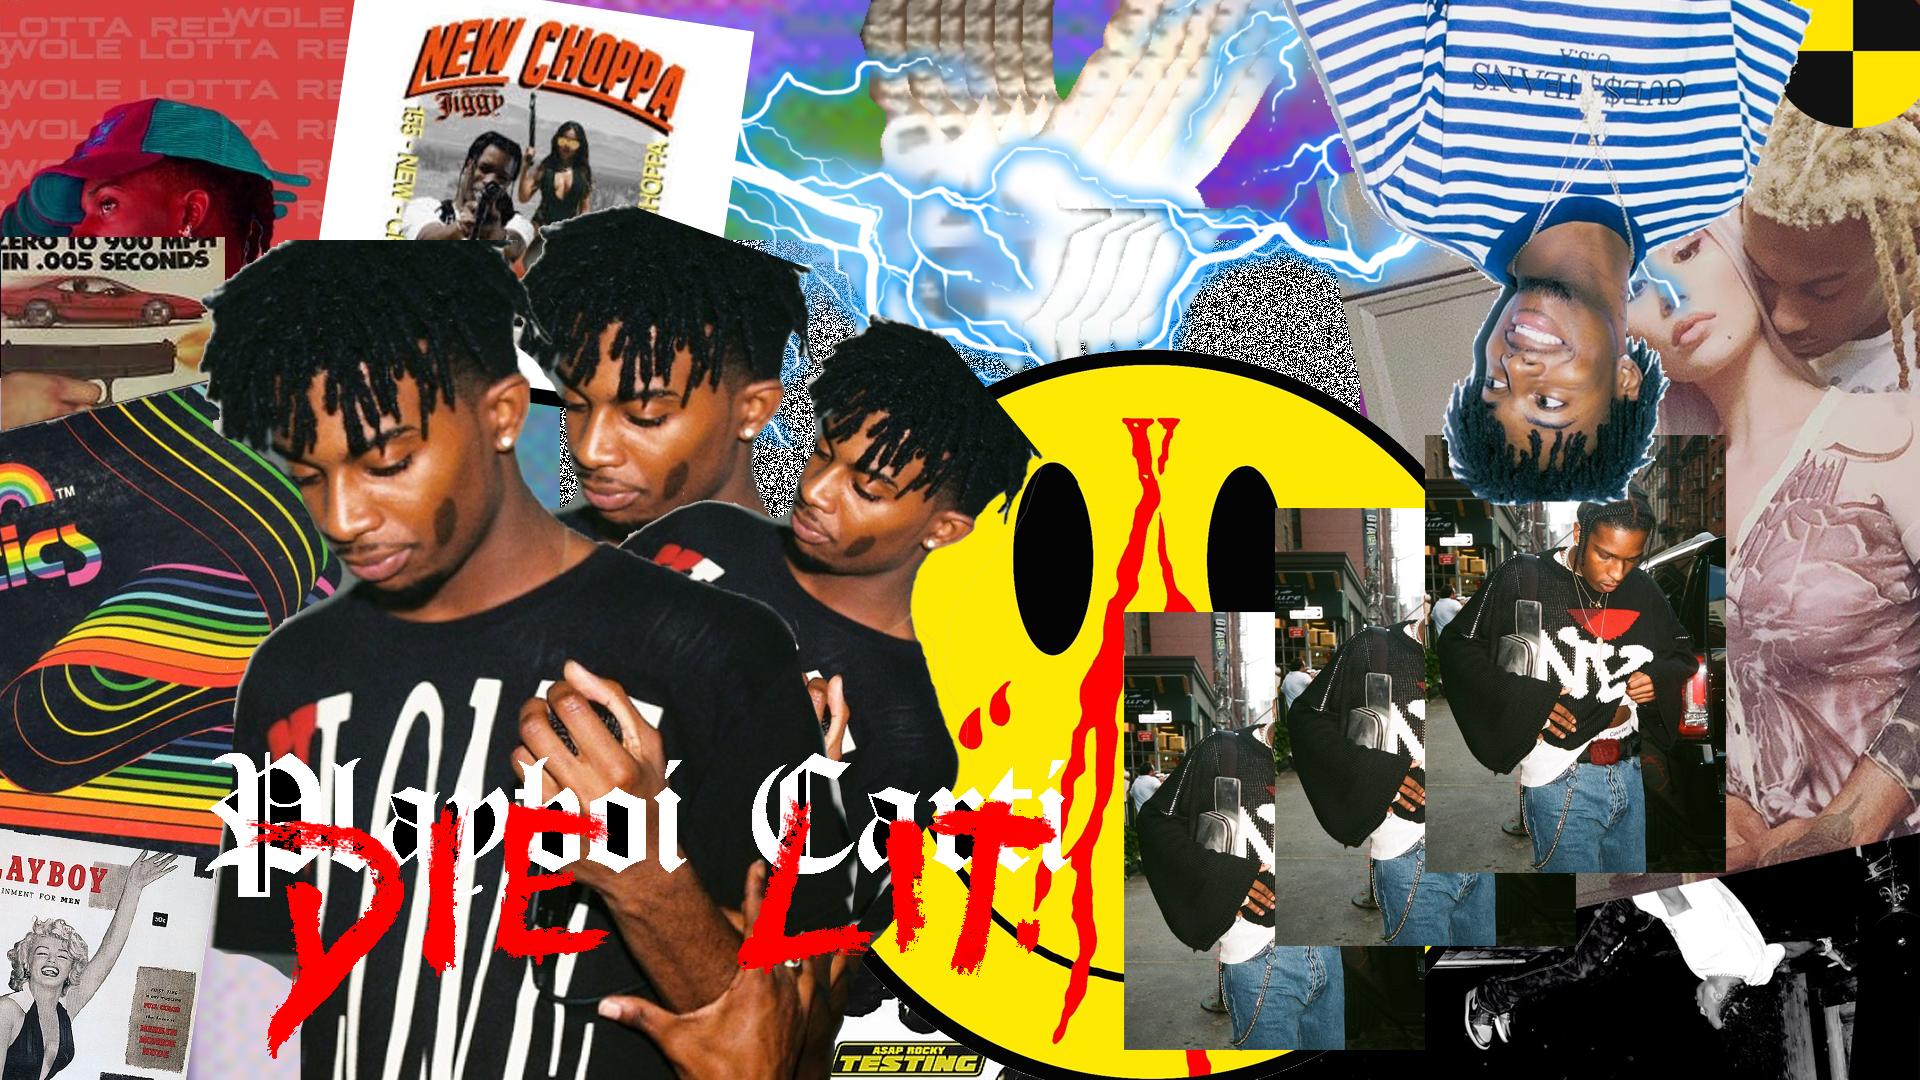 Playboi Carti Collage background/wallpaper. Rap